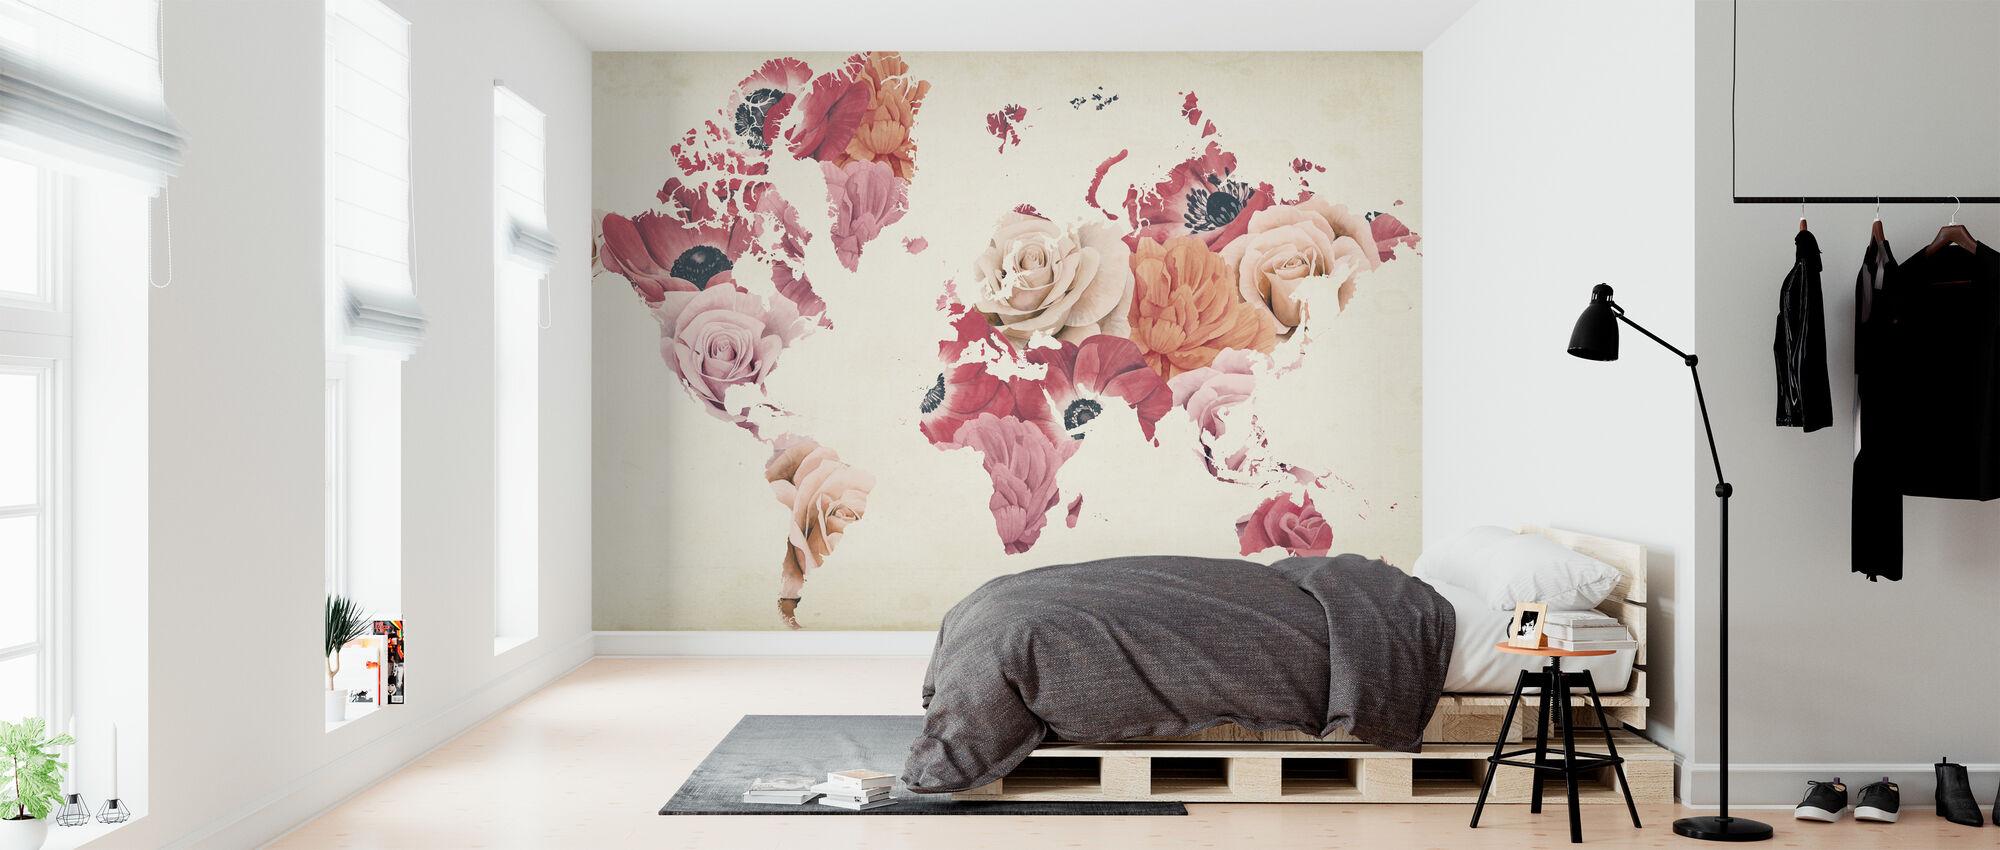 Earth Laughs in Flowers - Wallpaper - Bedroom